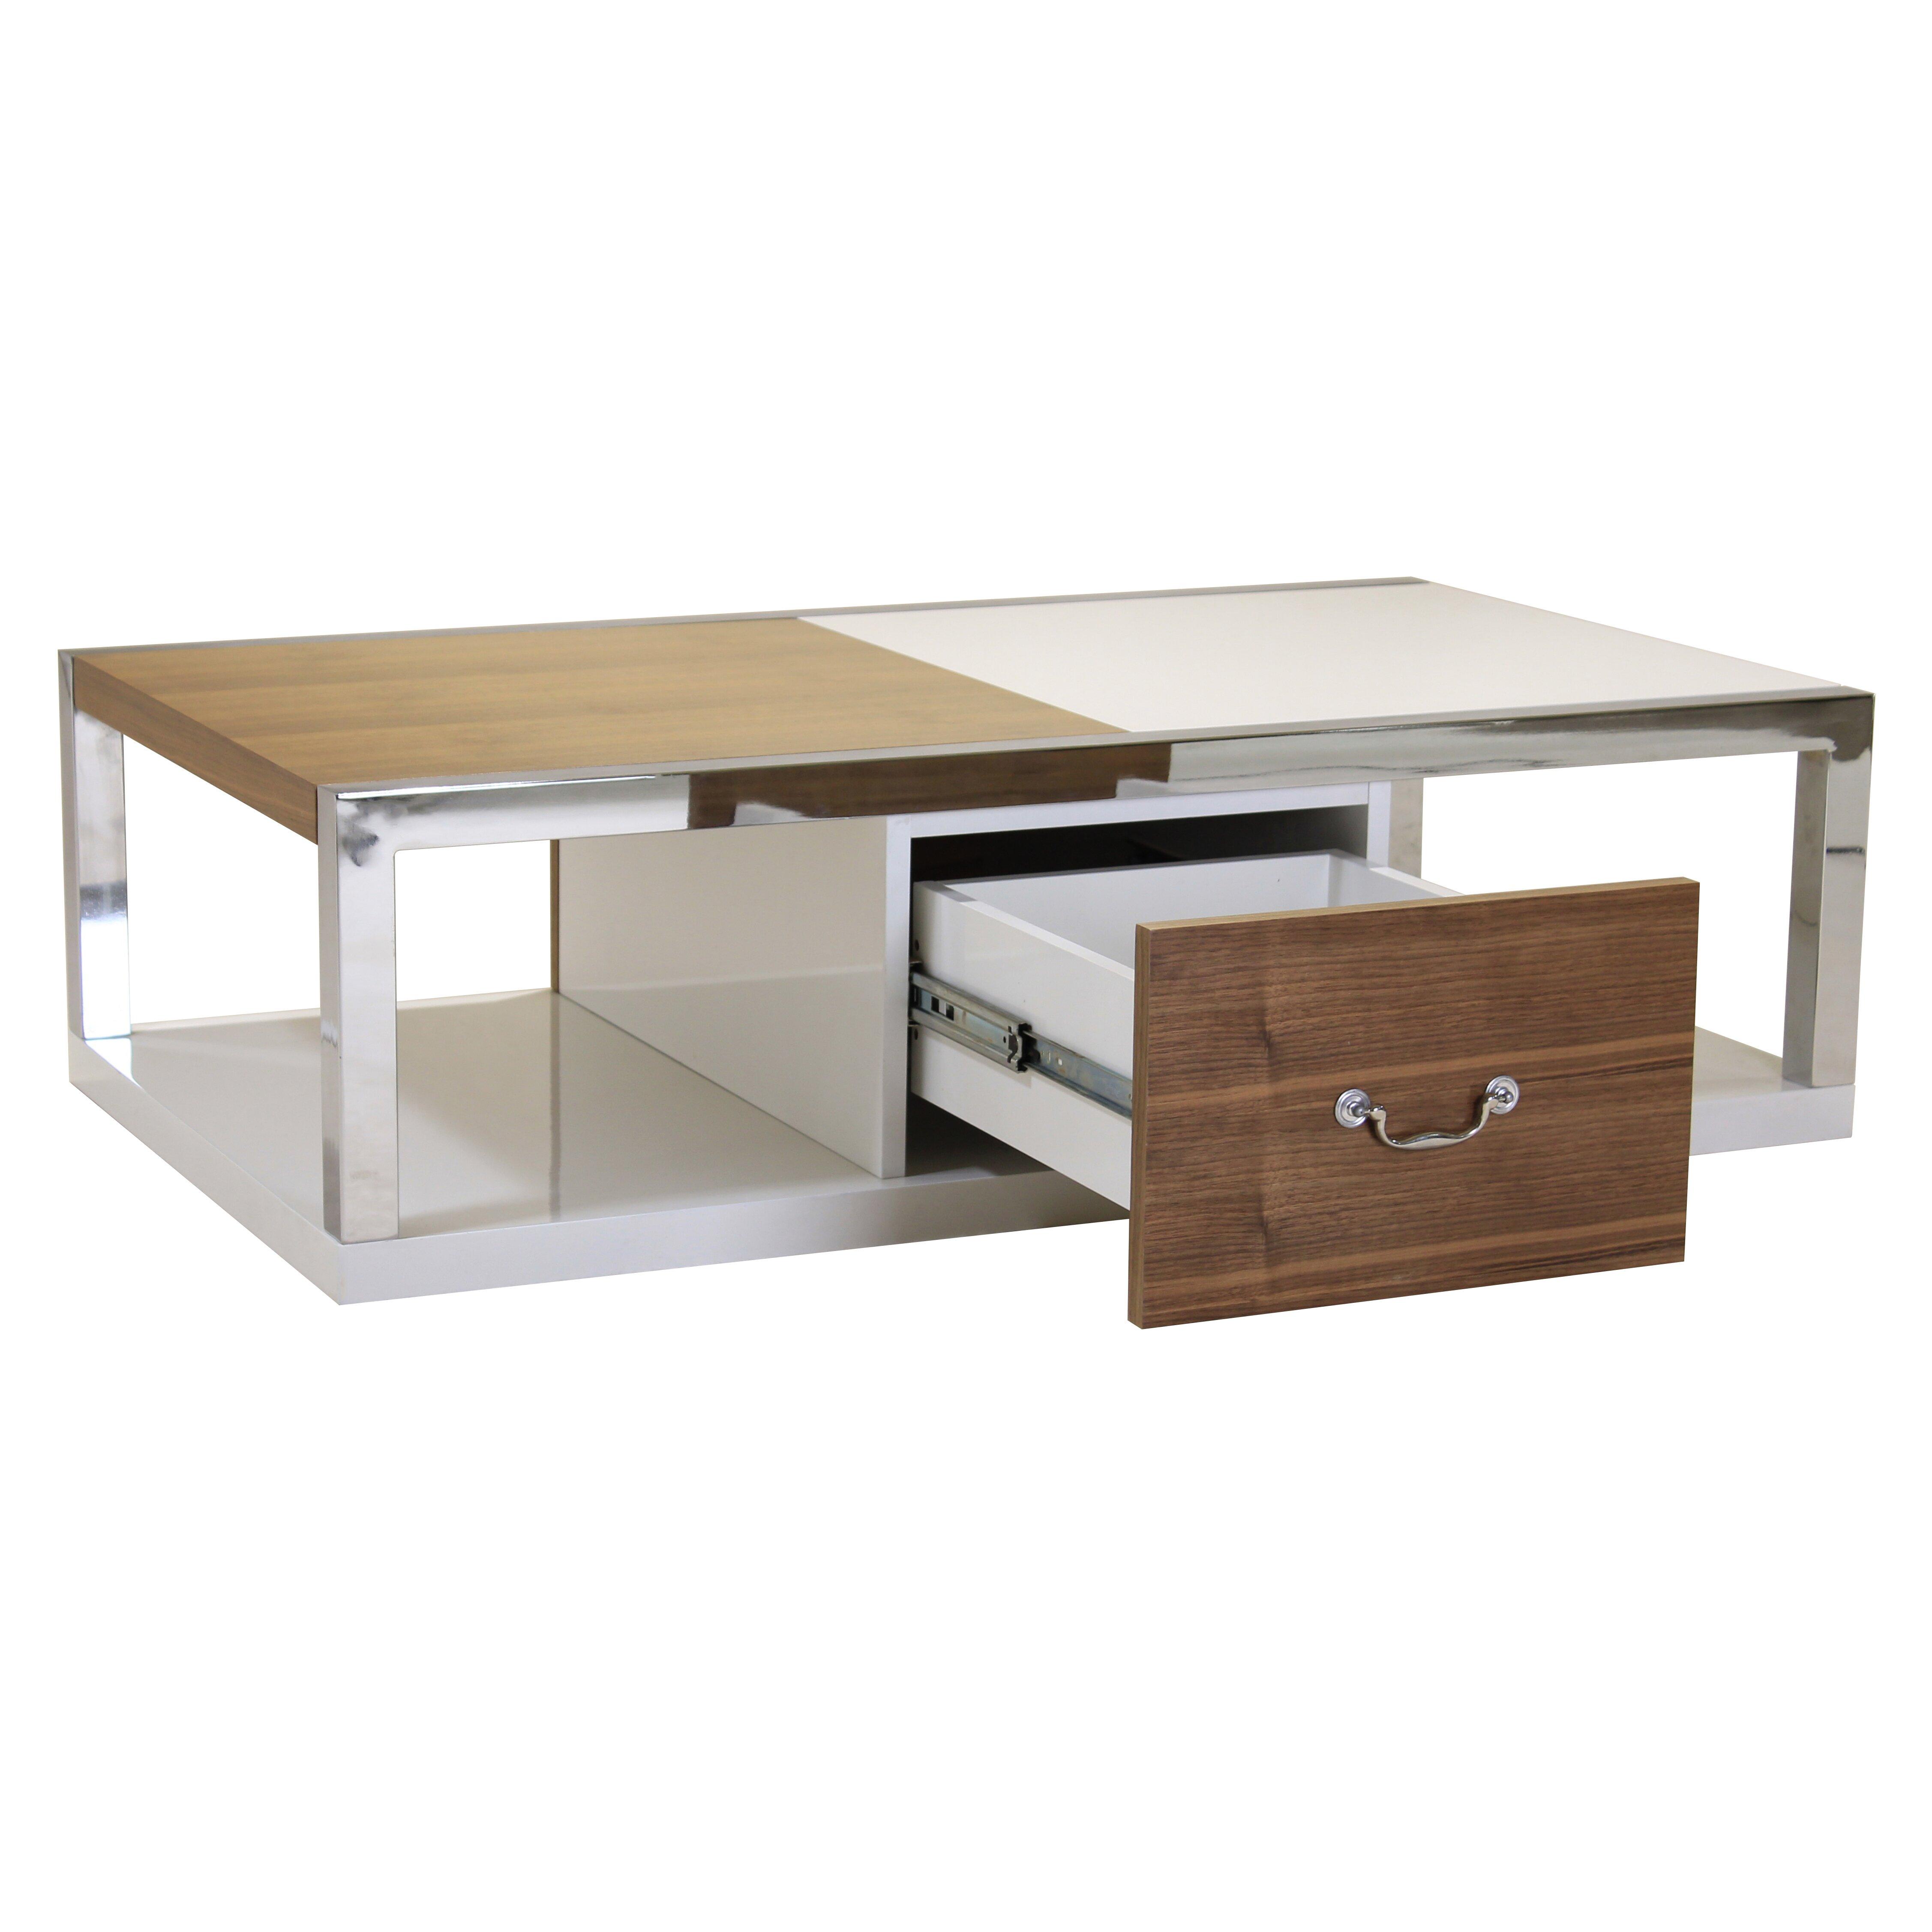 Wayfair Glass Coffee Table Uk: Heartlands Warwick Coffee Table With Magazine Rack